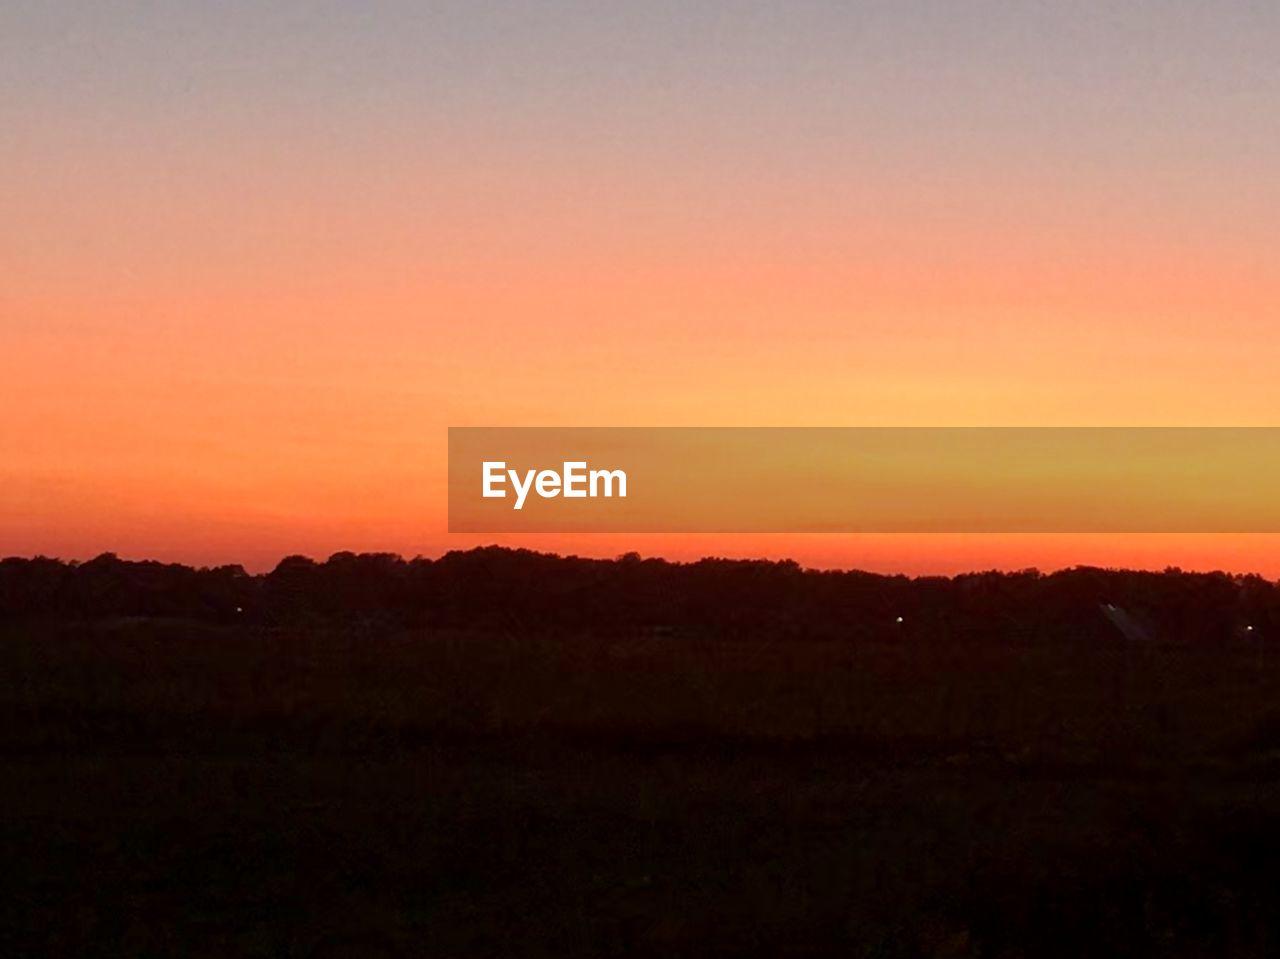 sunset, sky, scenics - nature, landscape, environment, beauty in nature, silhouette, tranquility, tranquil scene, orange color, nature, copy space, no people, dramatic sky, outdoors, non-urban scene, idyllic, horizon, land, sun, romantic sky, dark